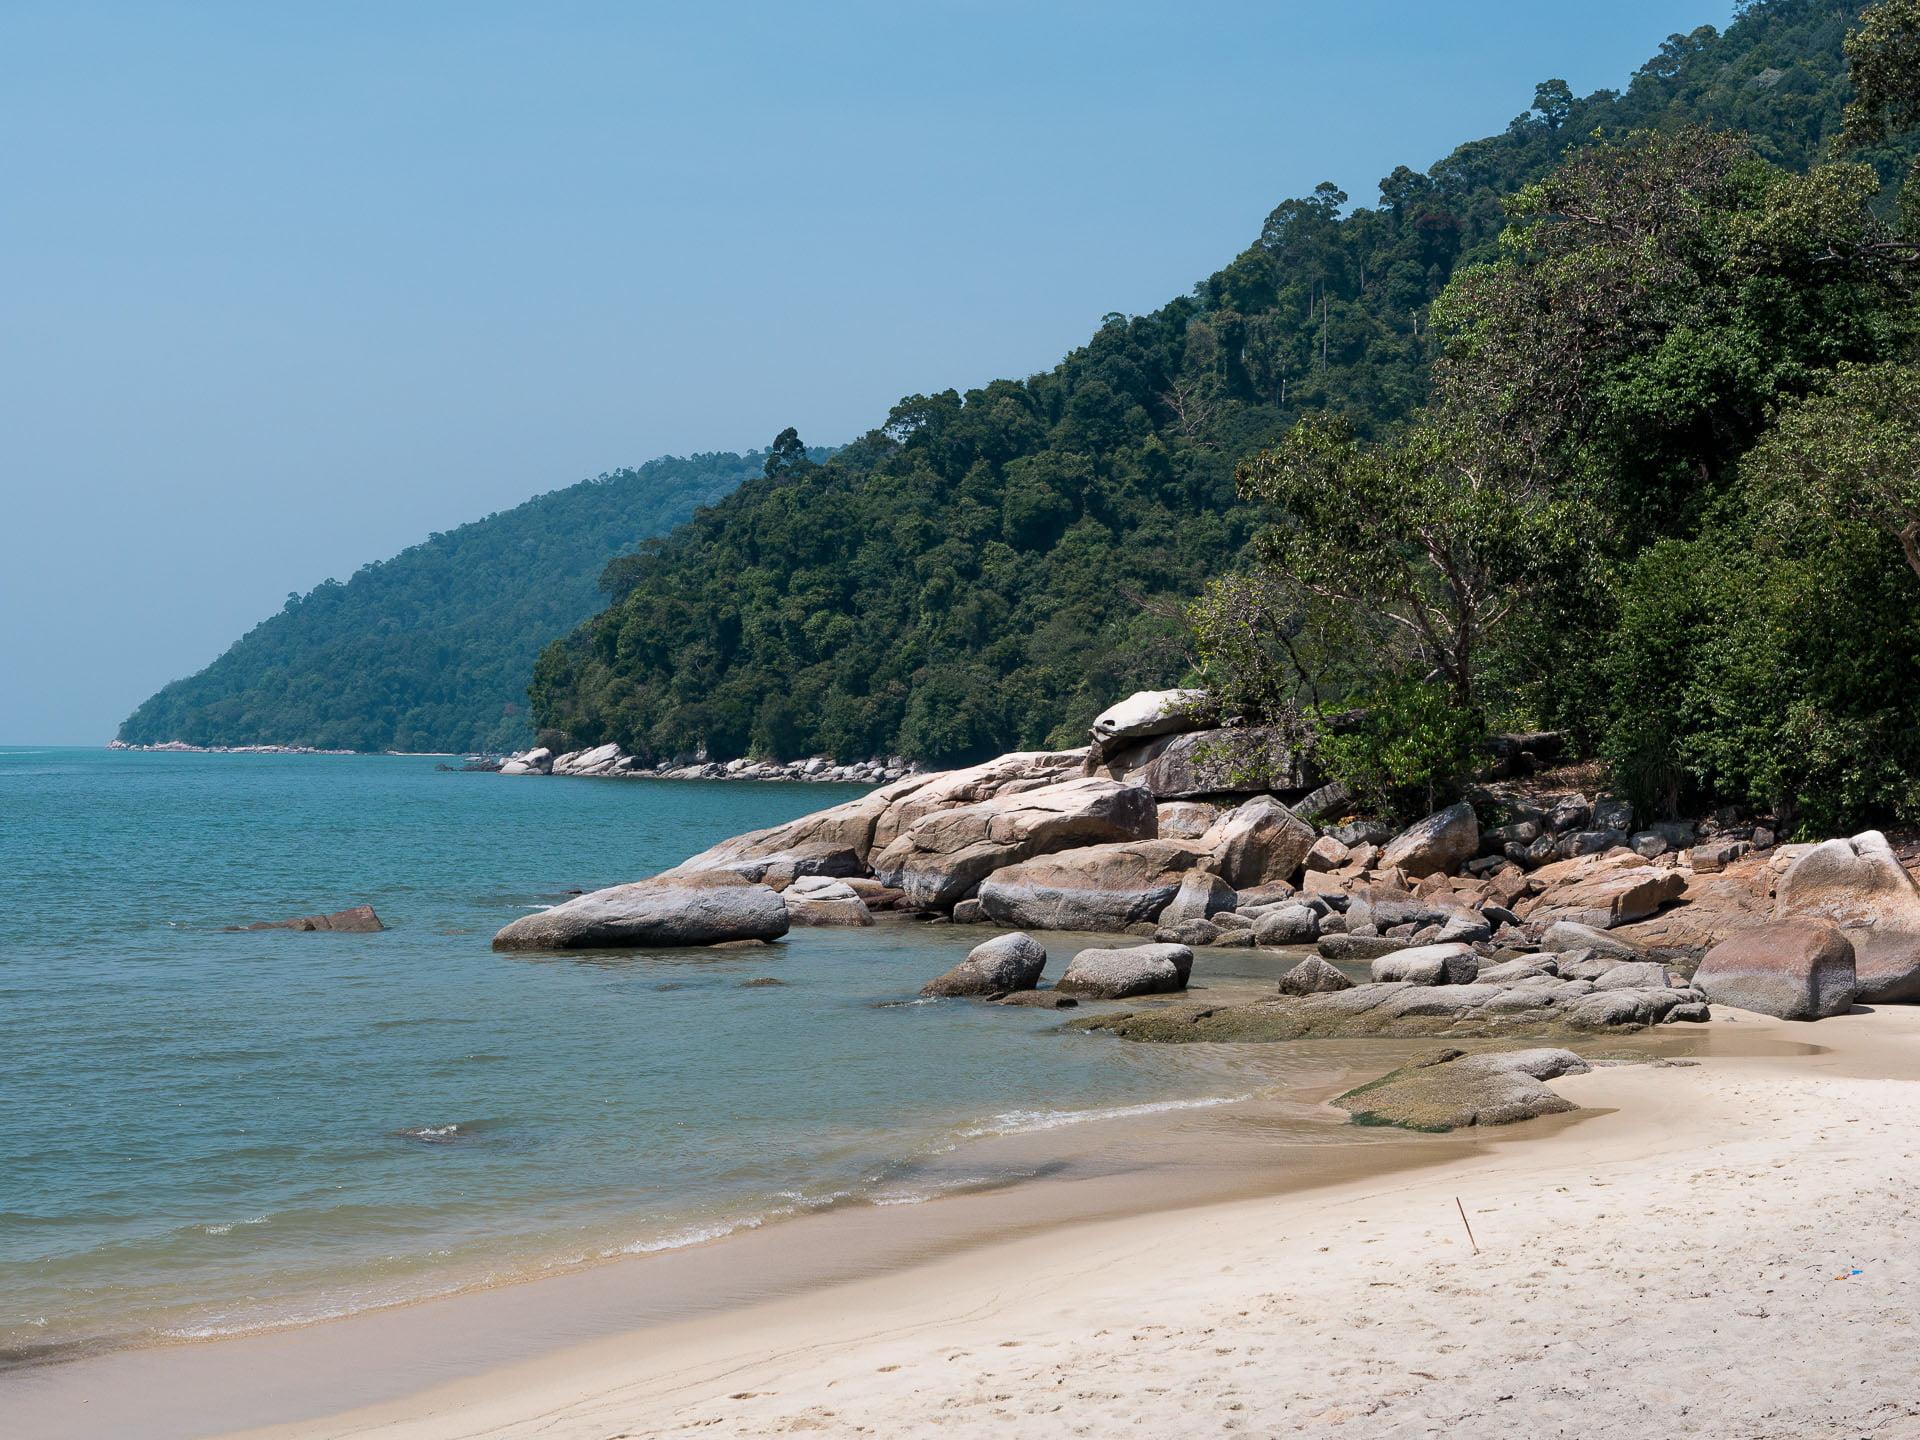 Penang parc naturel plage bis - Les globe blogueurs - blog voyage nature